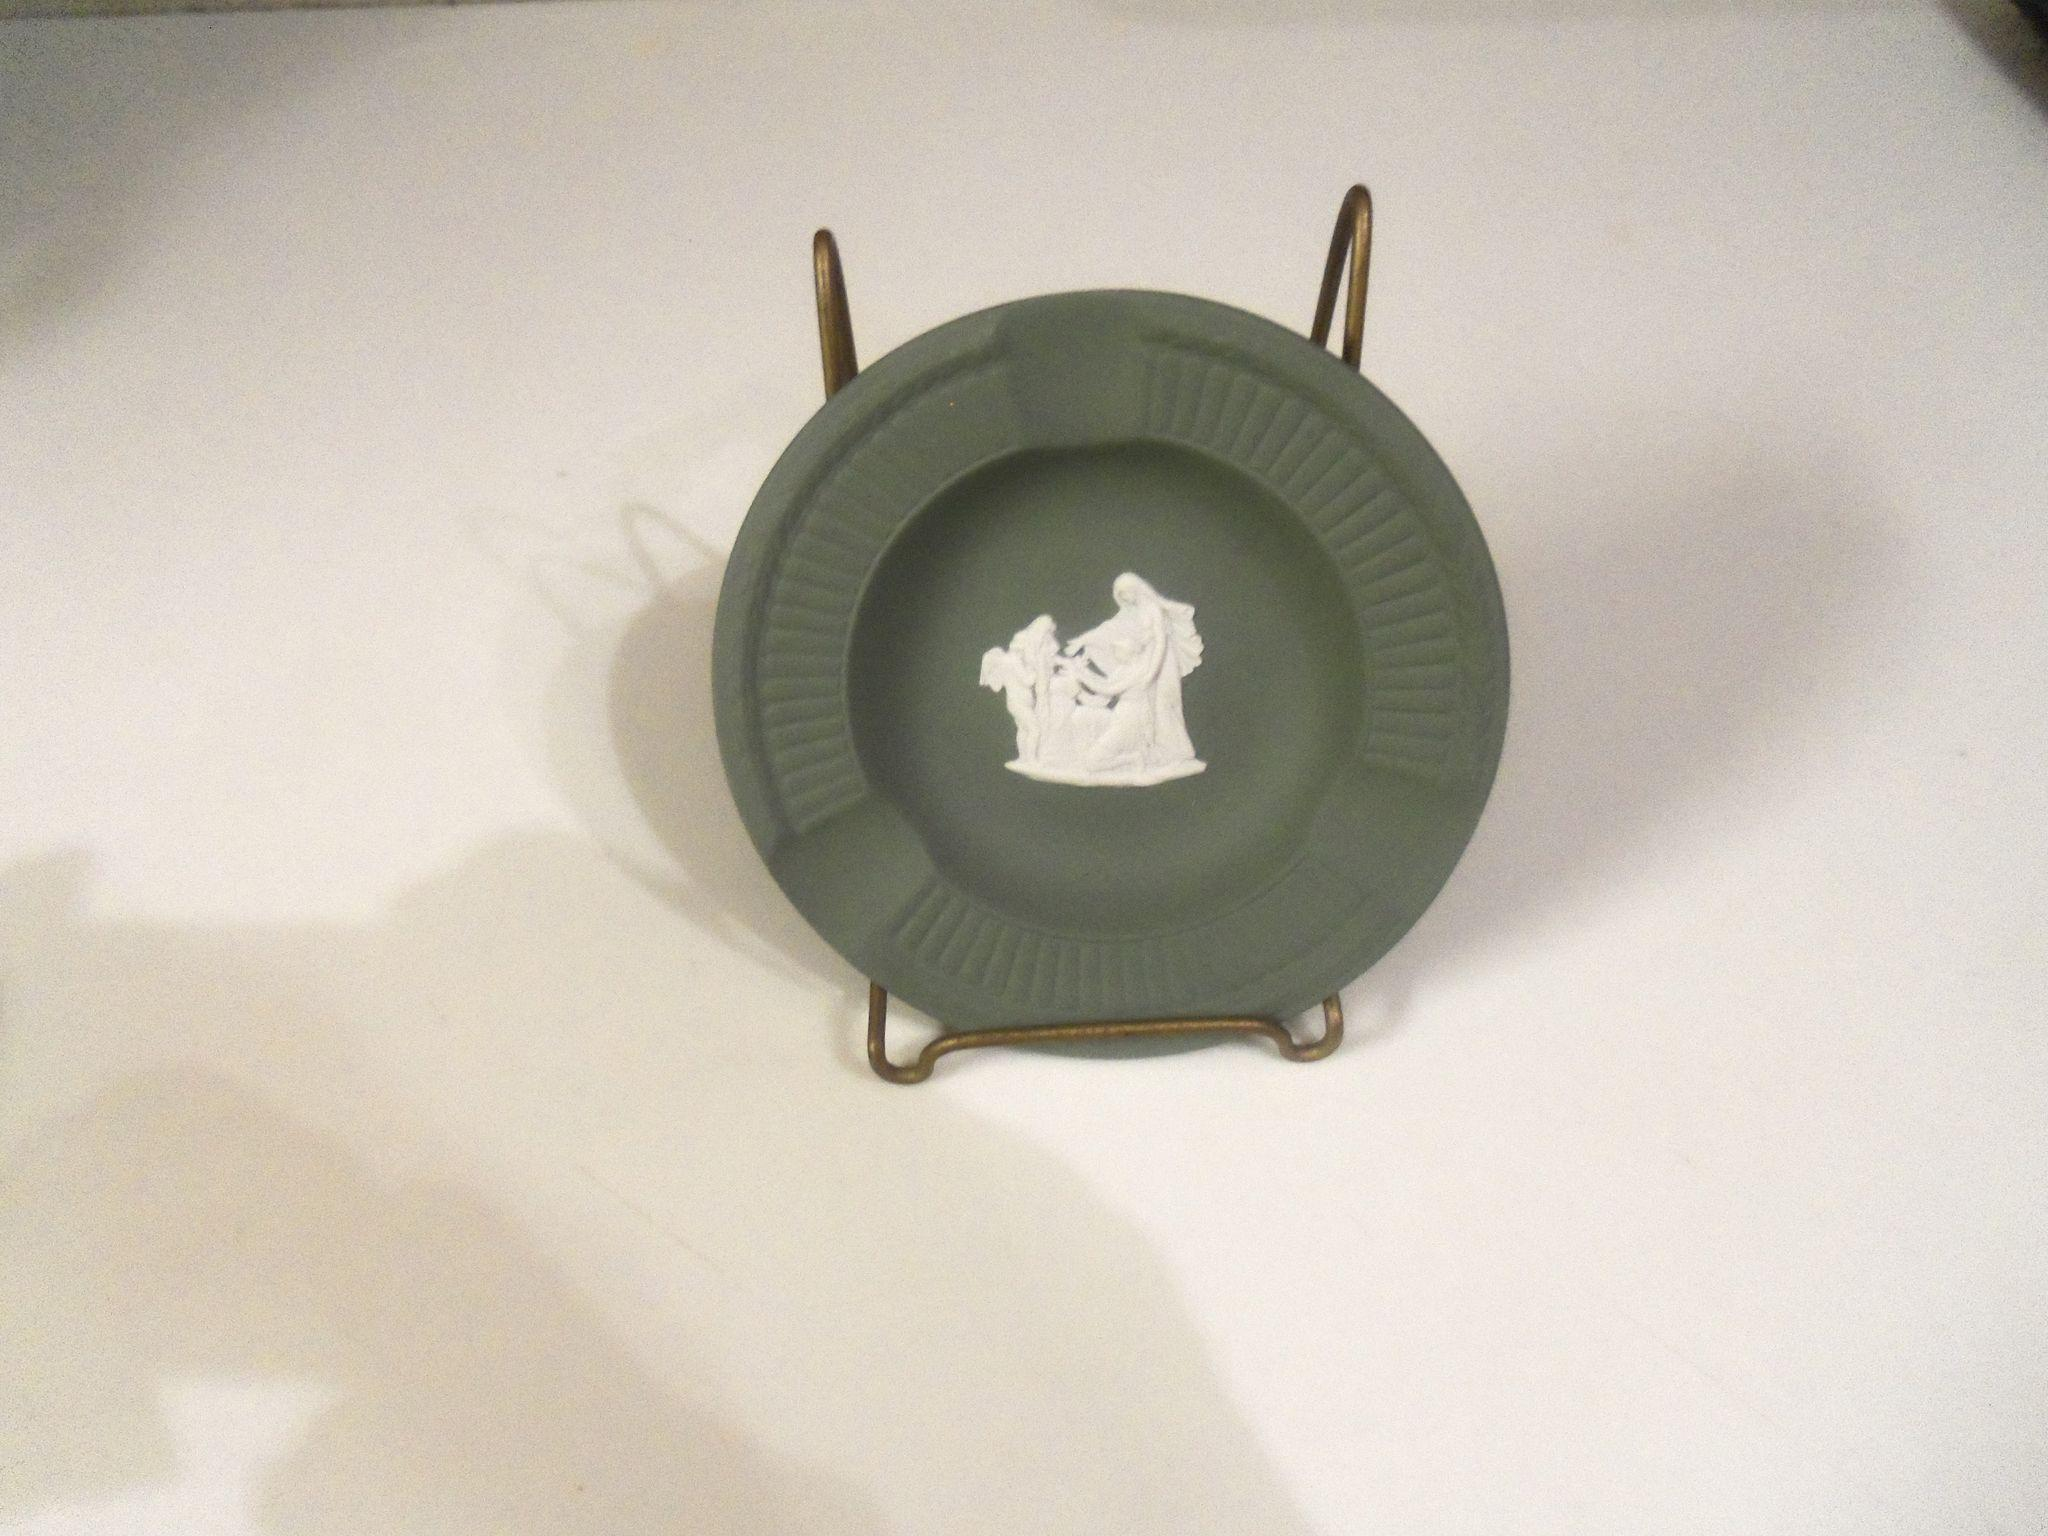 Vintage Wedgwood Sage Green  3 Slots Ash Tray  Original Box and Papers